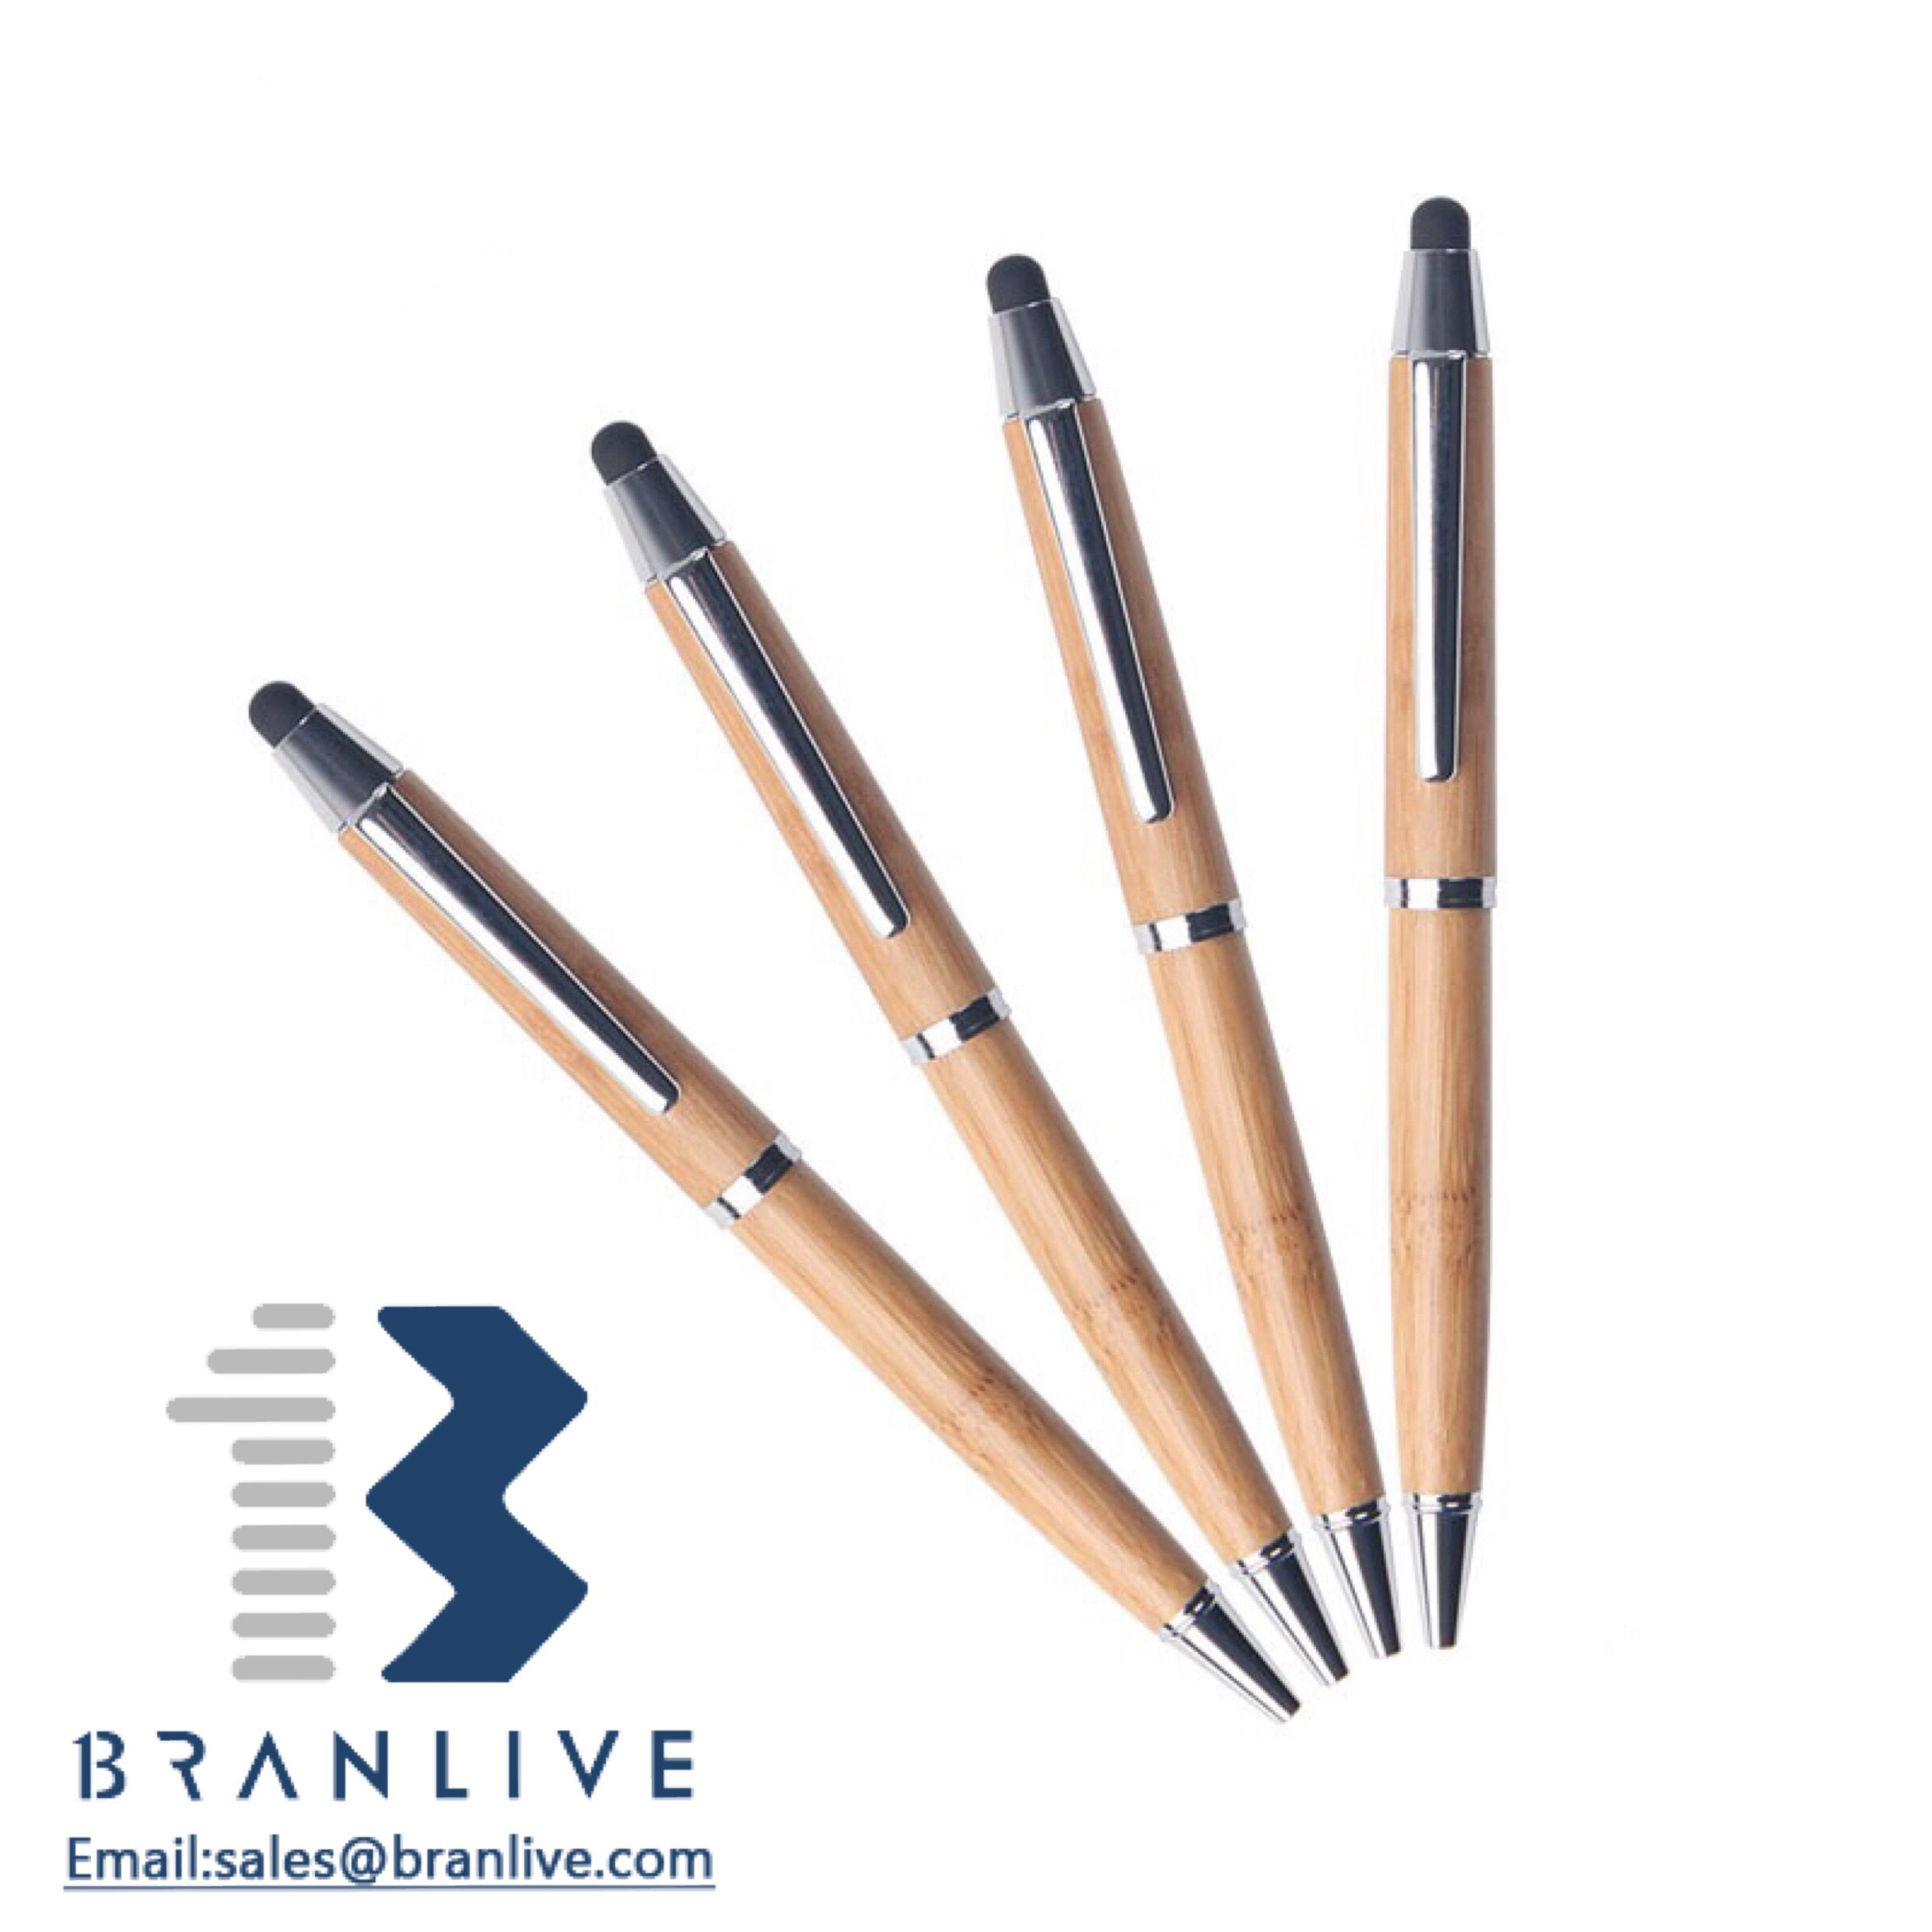 Wooden Pen Set Handcrafted Wood Ballpoint Gel Gift Pen Set Extra